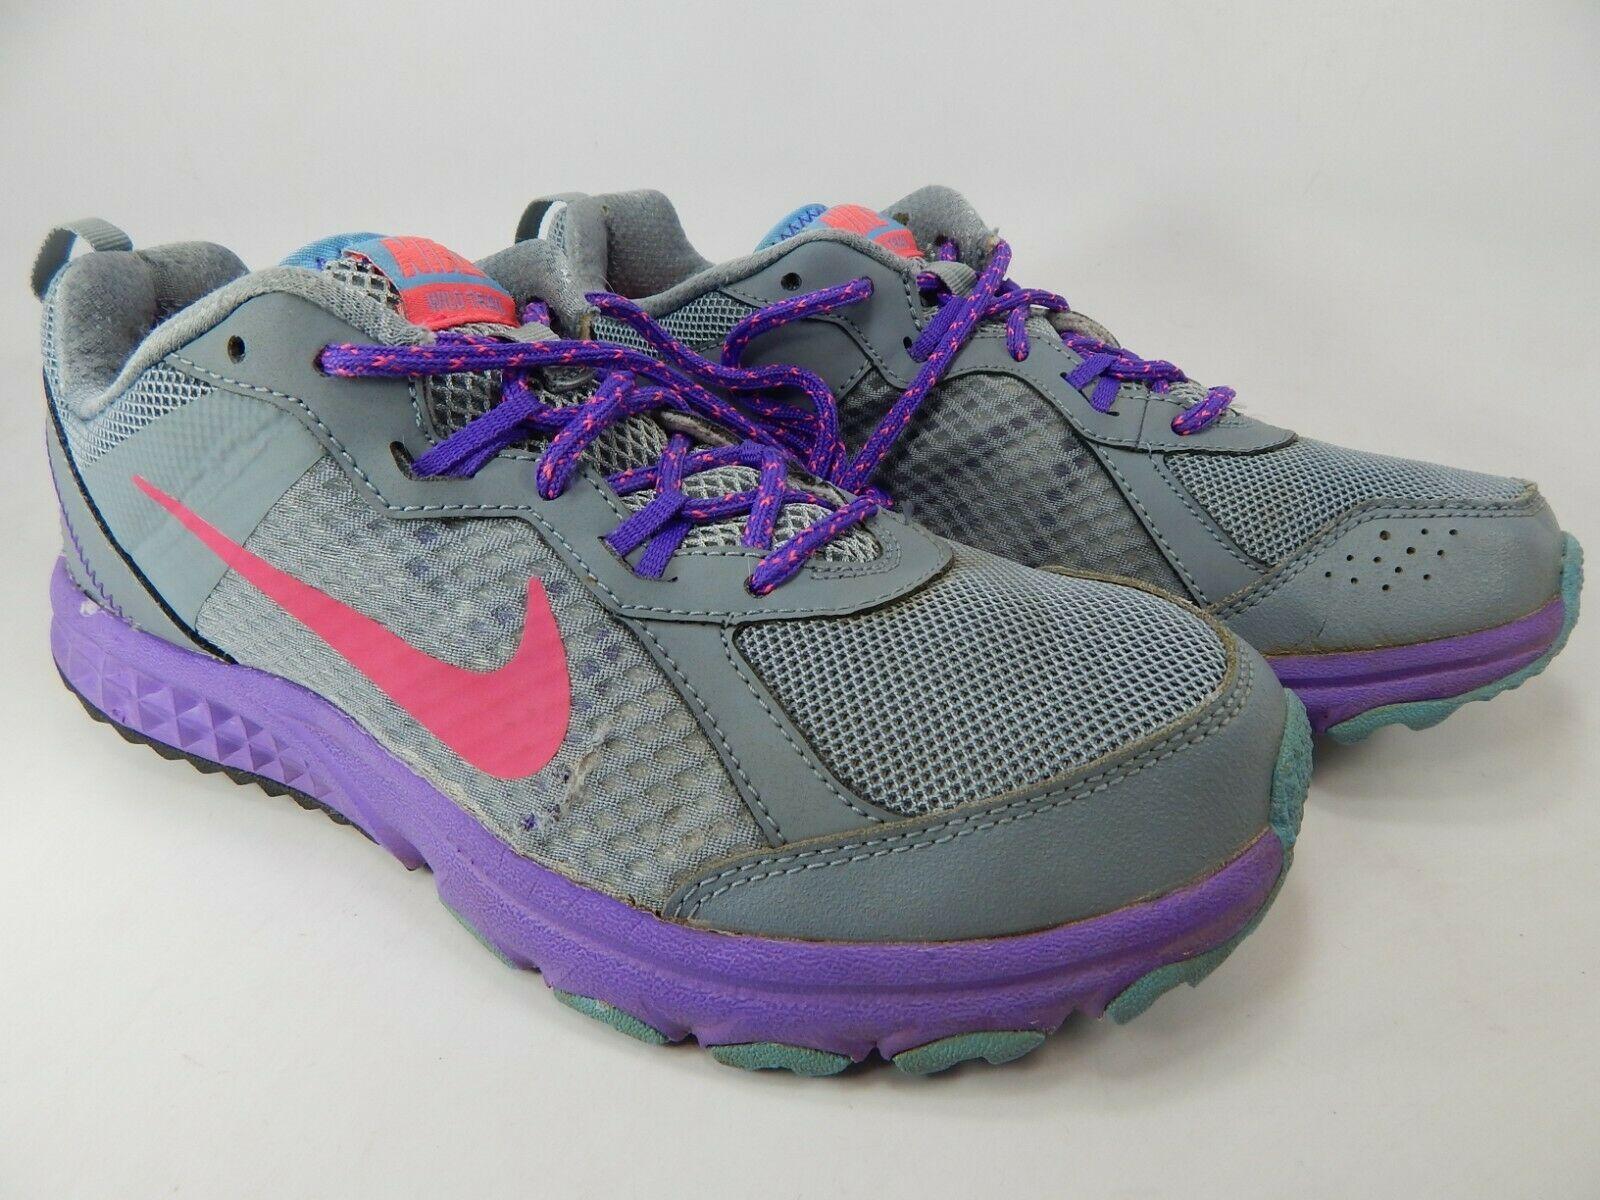 buy popular 9a617 c26d6 Nike Wild Trail Size 9 M (B) EU 40.5 Women s and 50 similar items